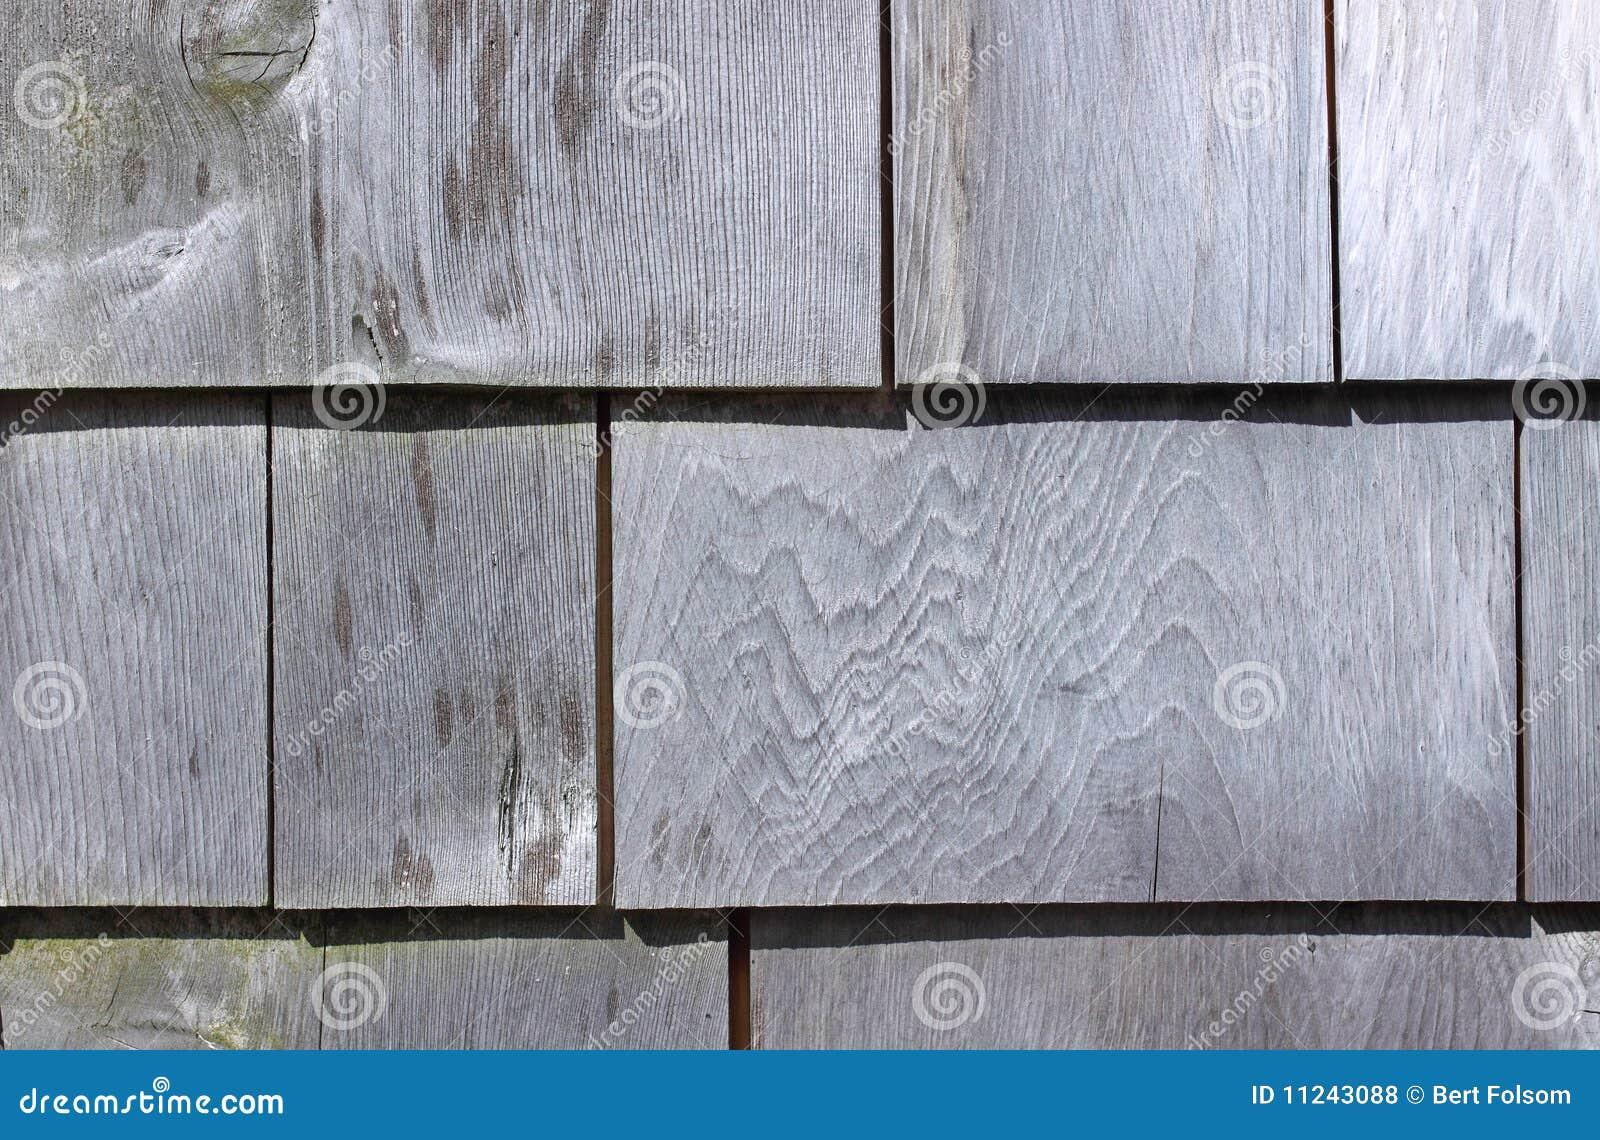 Exterior Wall Shingles : Weathered exterior cedar shingles royalty free stock